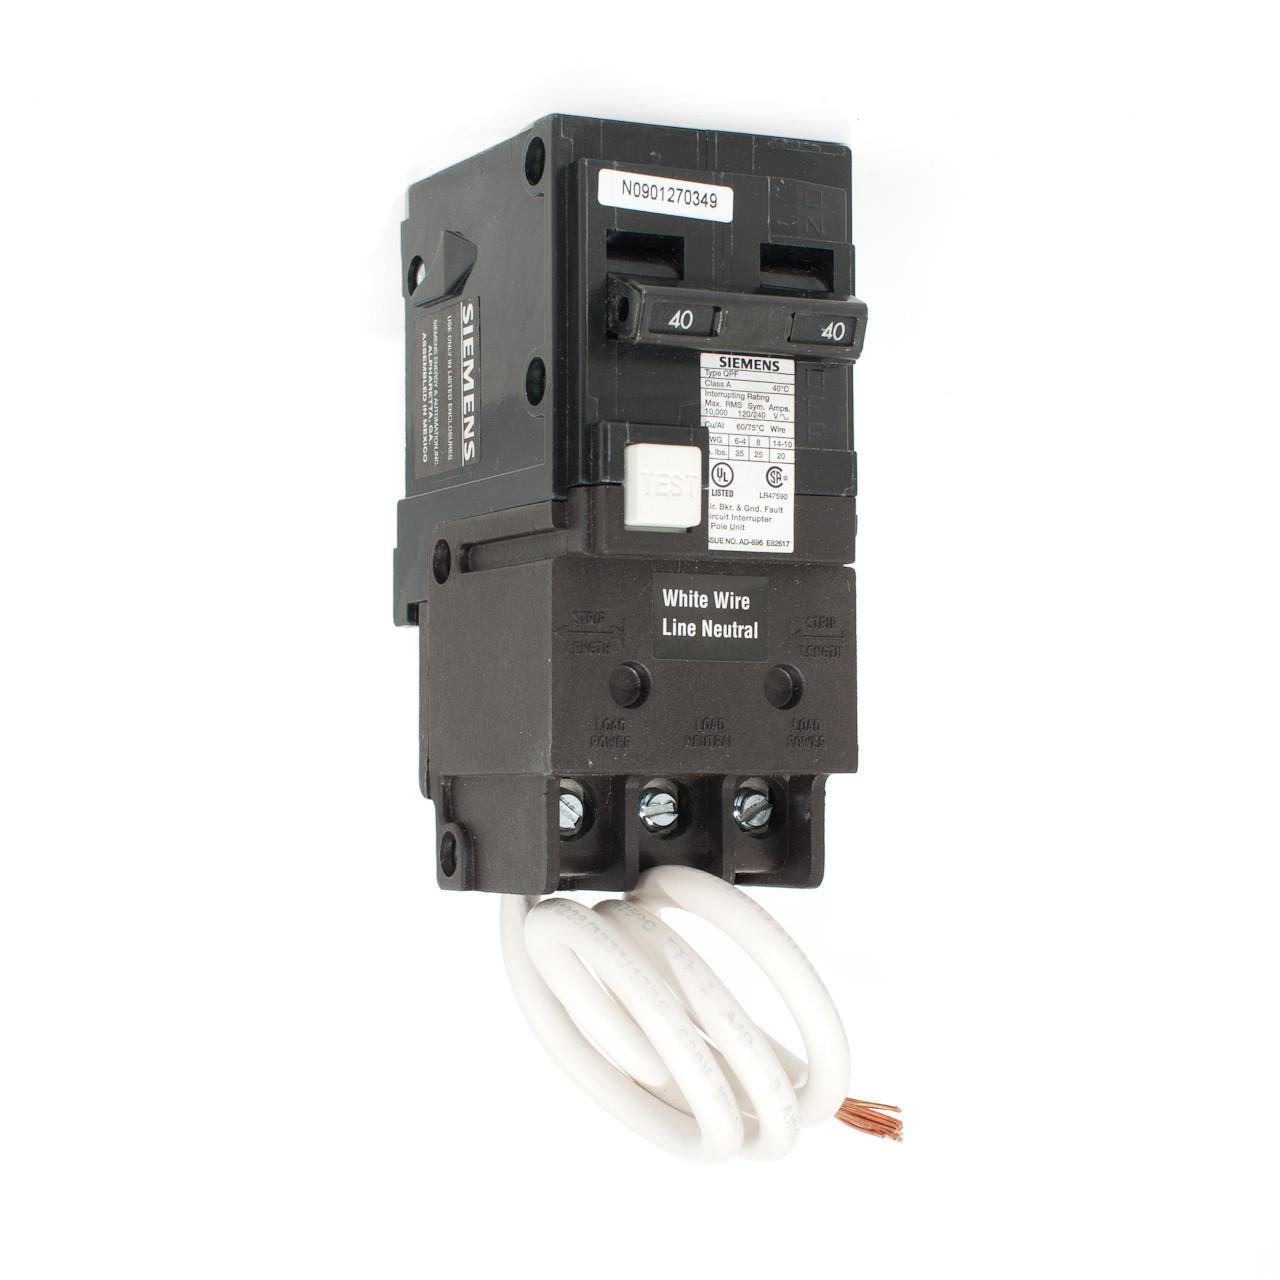 Siemens QF240 40A Two Pole GFCI Push-On Breaker